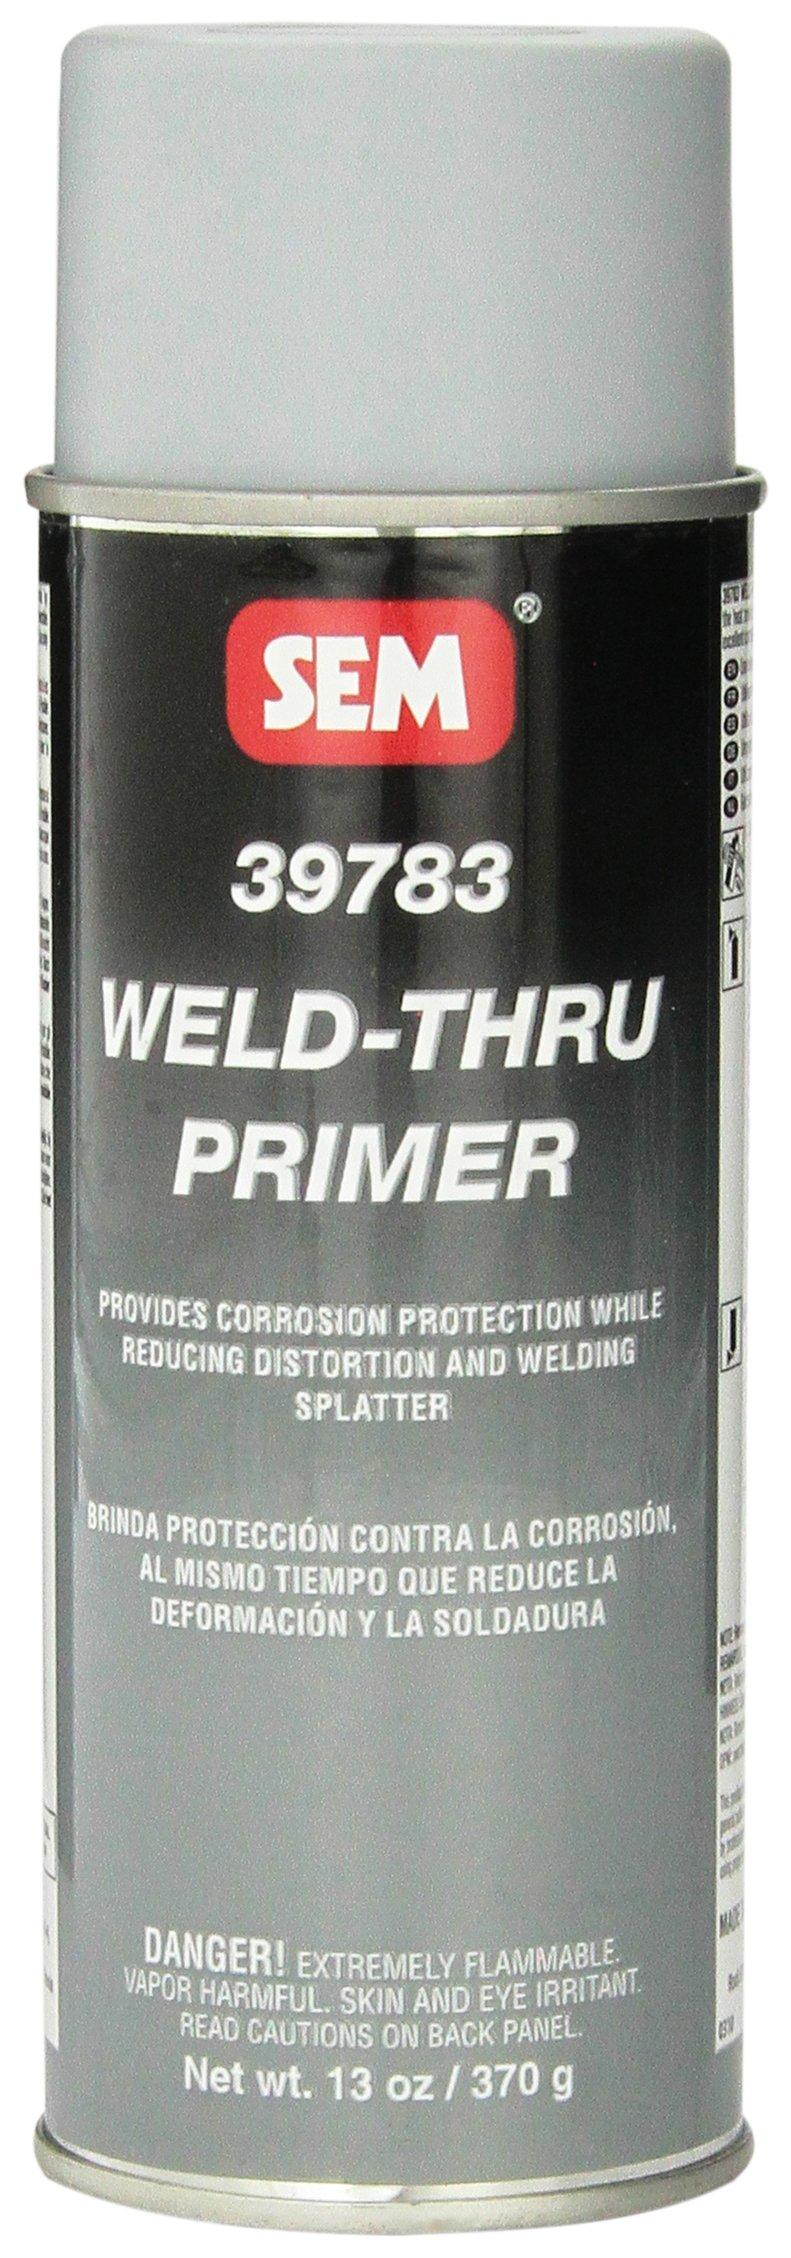 SEM 39783 Weld-Thru Primer - 13 oz.